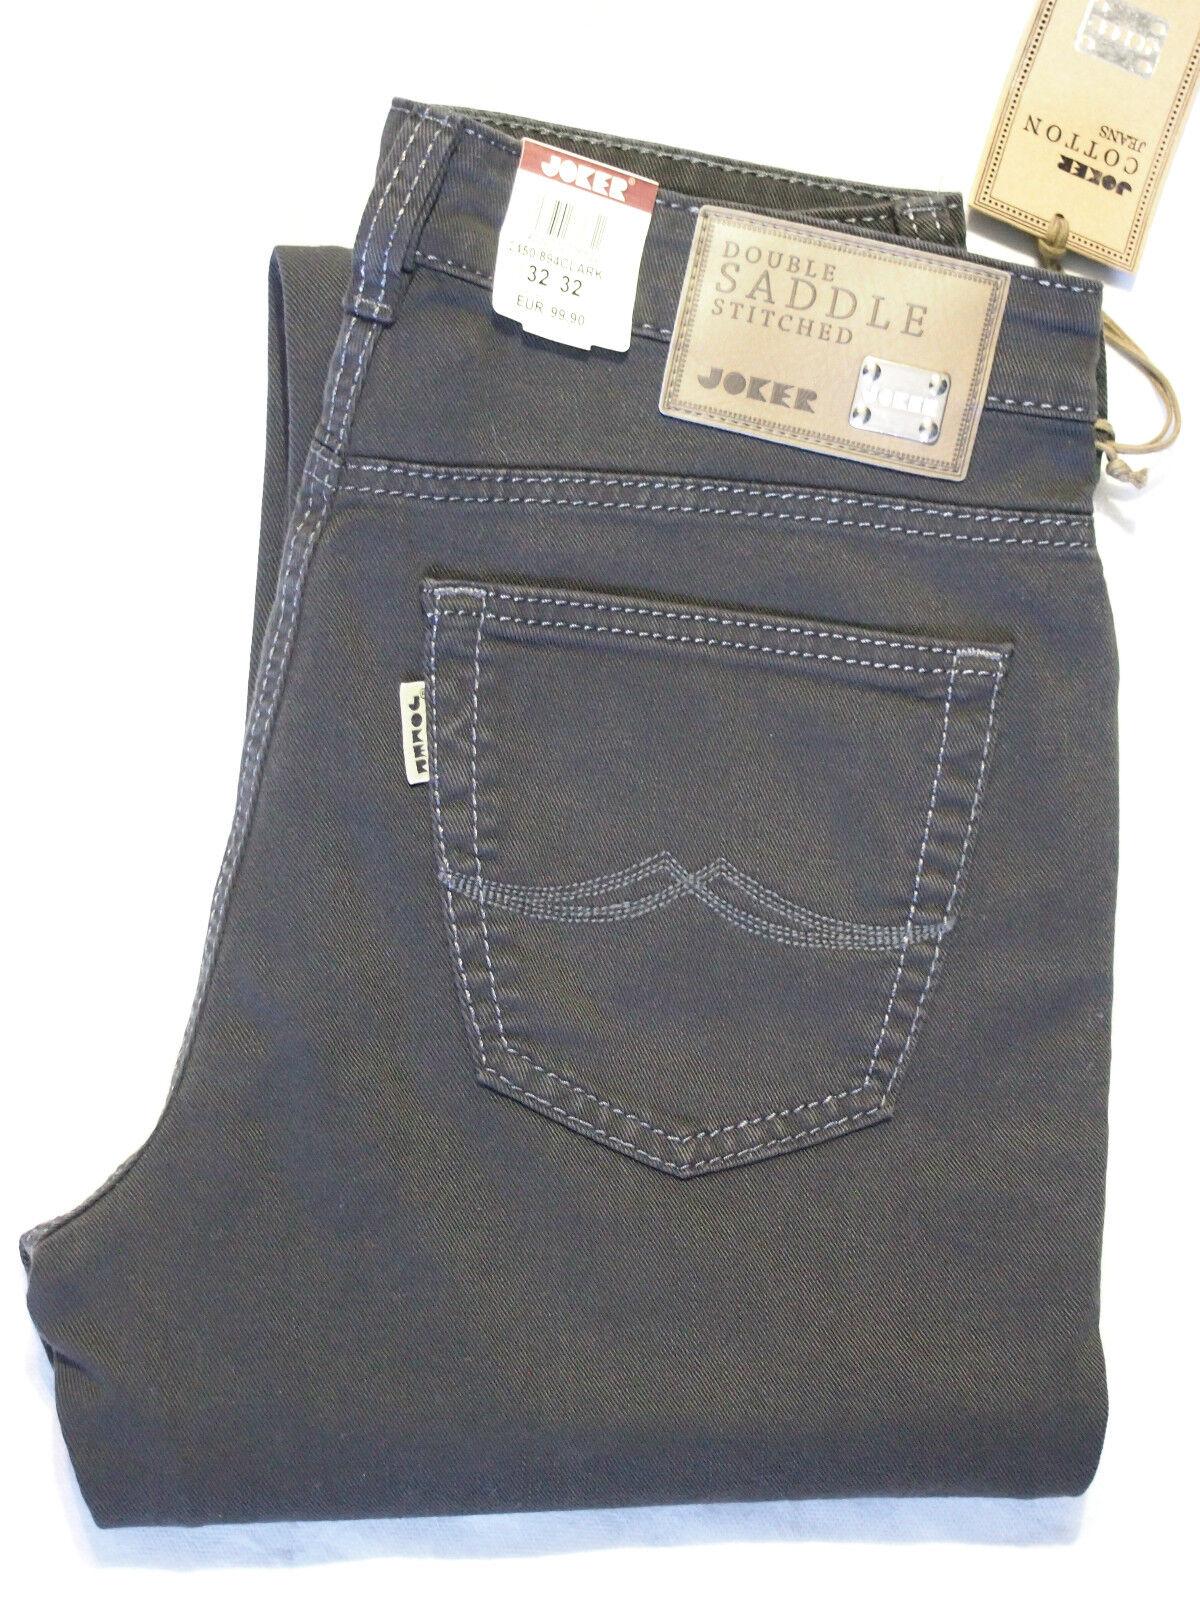 JOKER Jeans Clark Clark Clark coloredenim + elasticizzato 2450 894 ANTRACITE gr. VON 32 32 546918